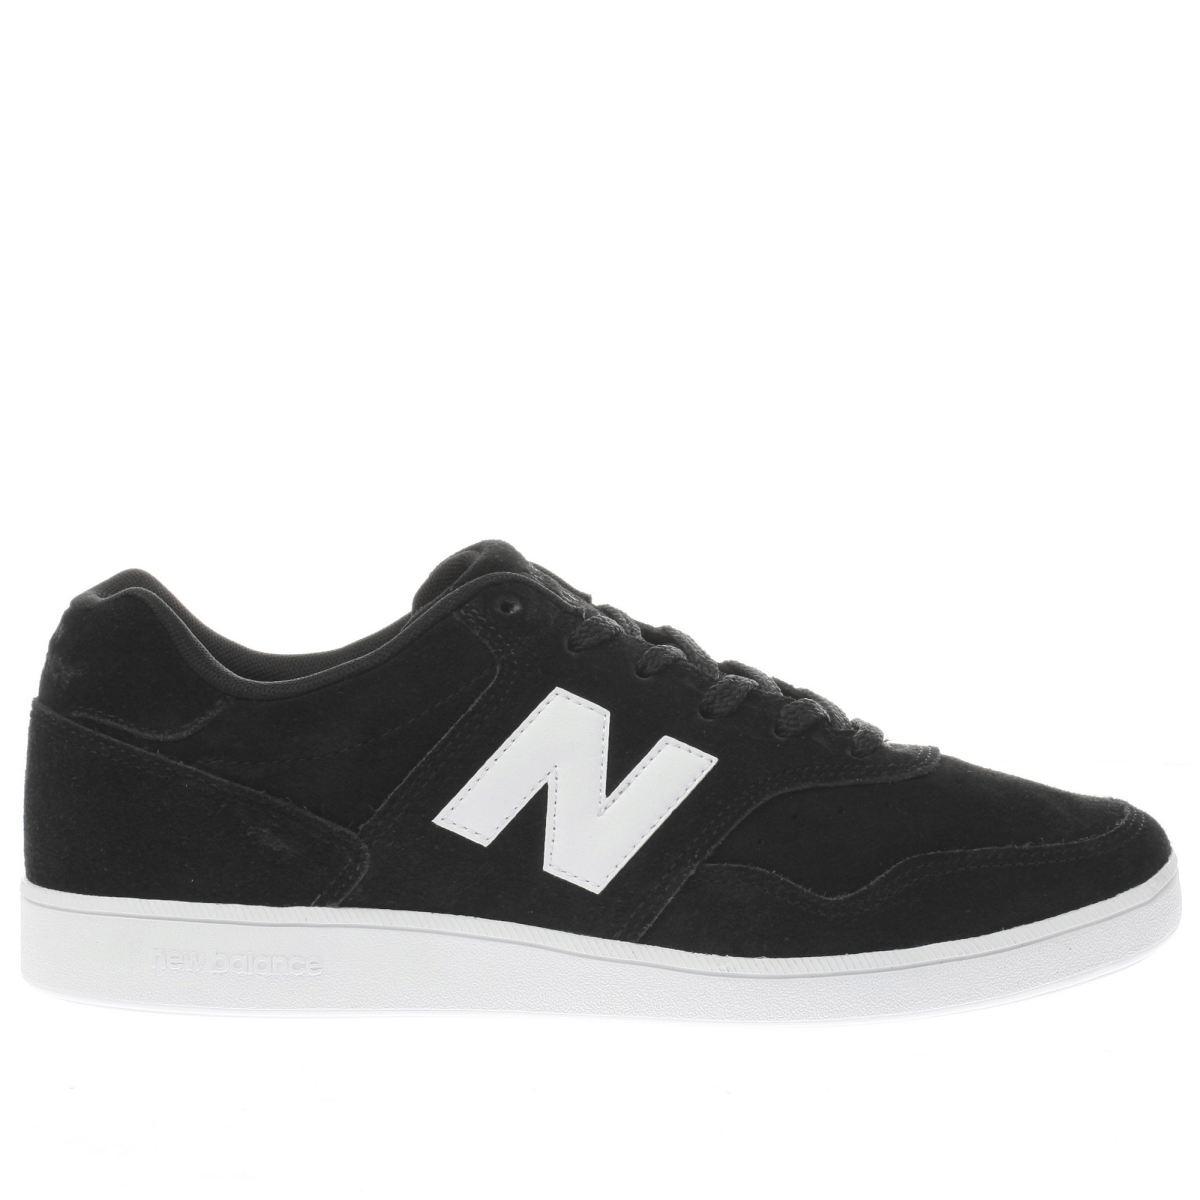 new balance black & white 288 trainers